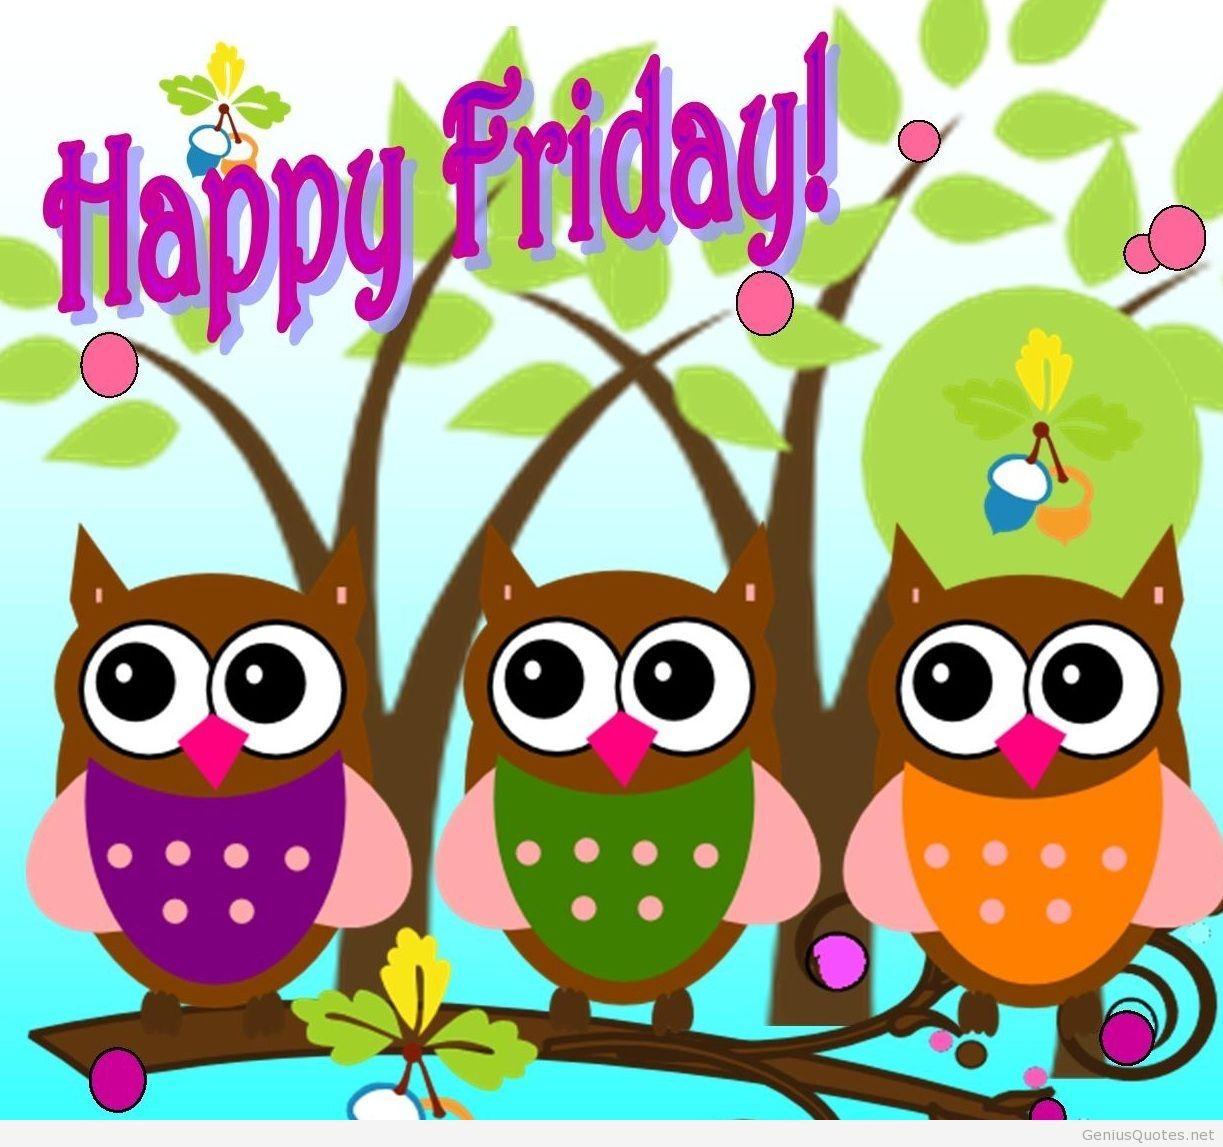 Happy Friday Quotes Funny Happy Friday C-Happy Friday Quotes Funny Happy Friday Clipart Cartoon 20140904120643-0